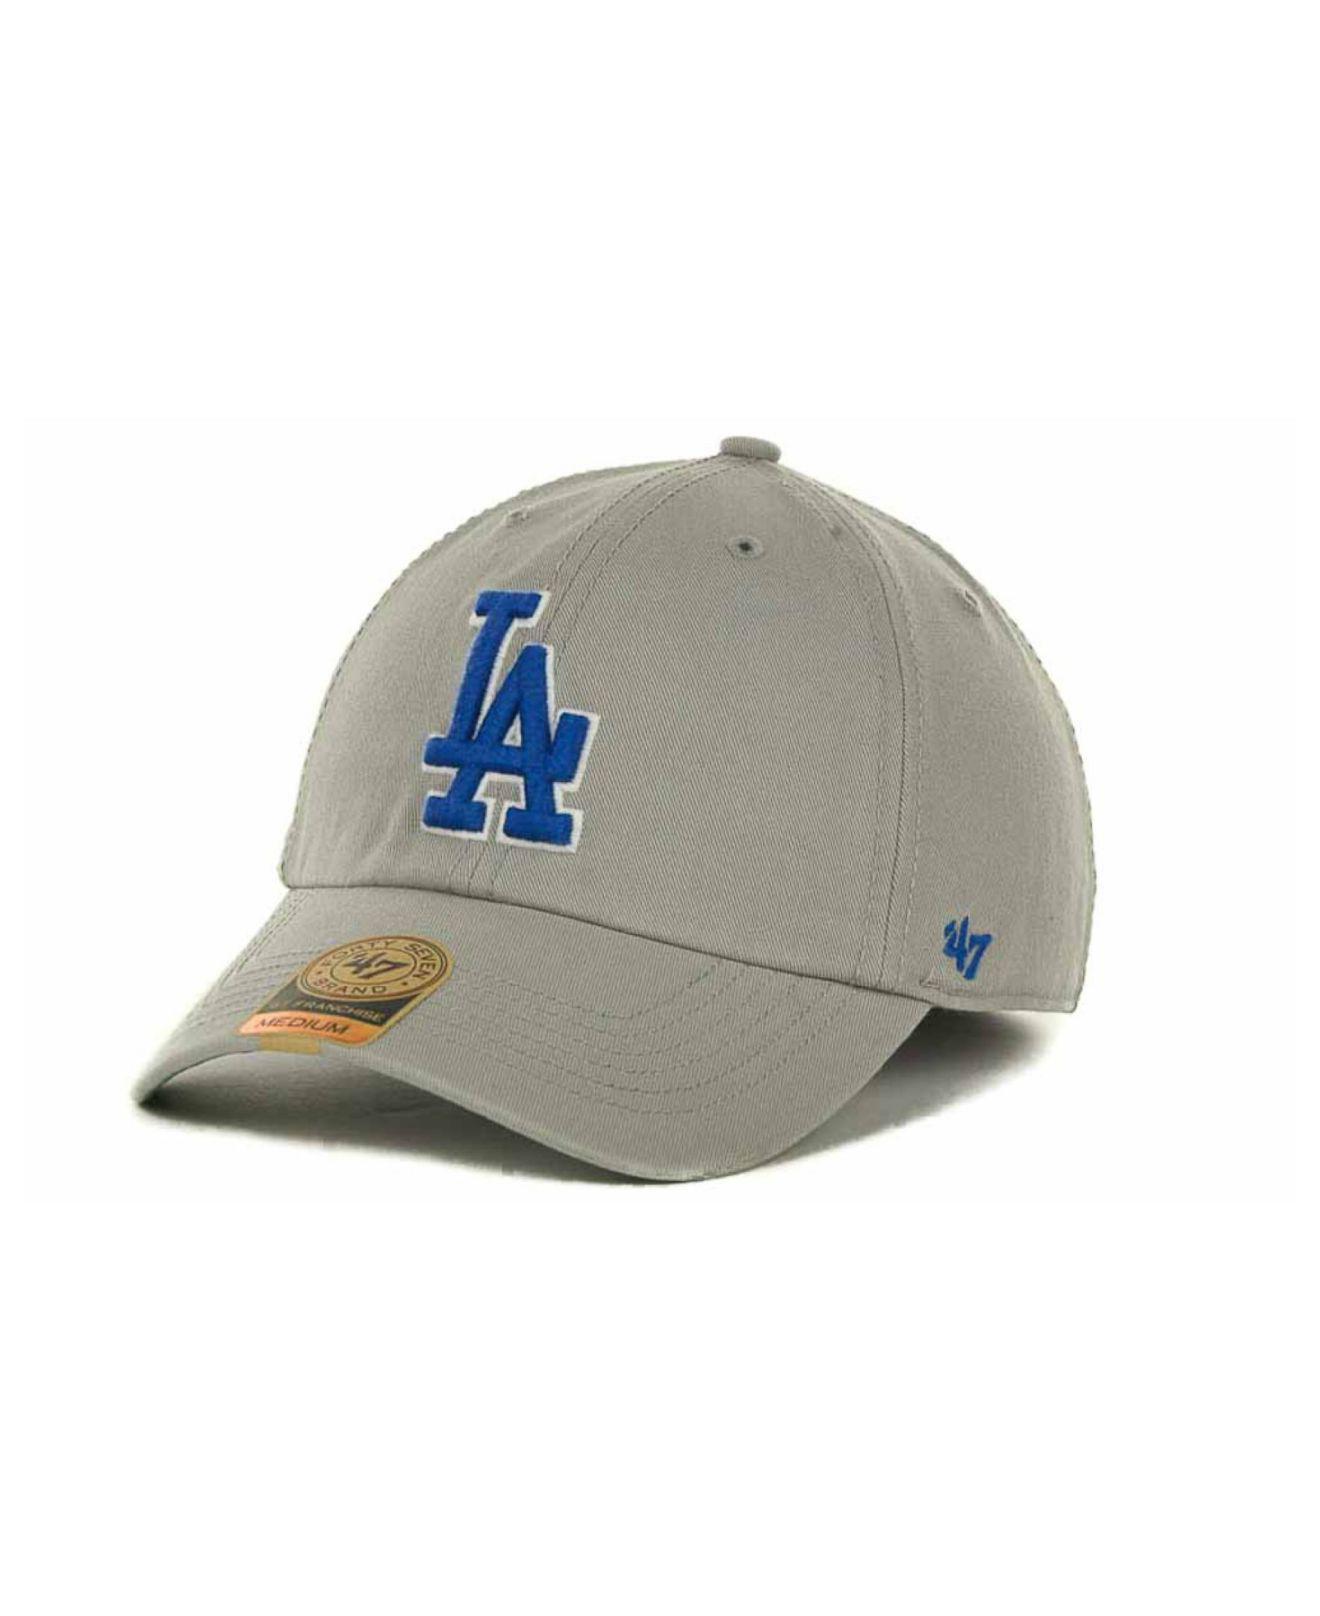 purchase cheap df93b 25a92 ... Los Angeles Dodgers Franchise Cap for Men - Lyst. View fullscreen